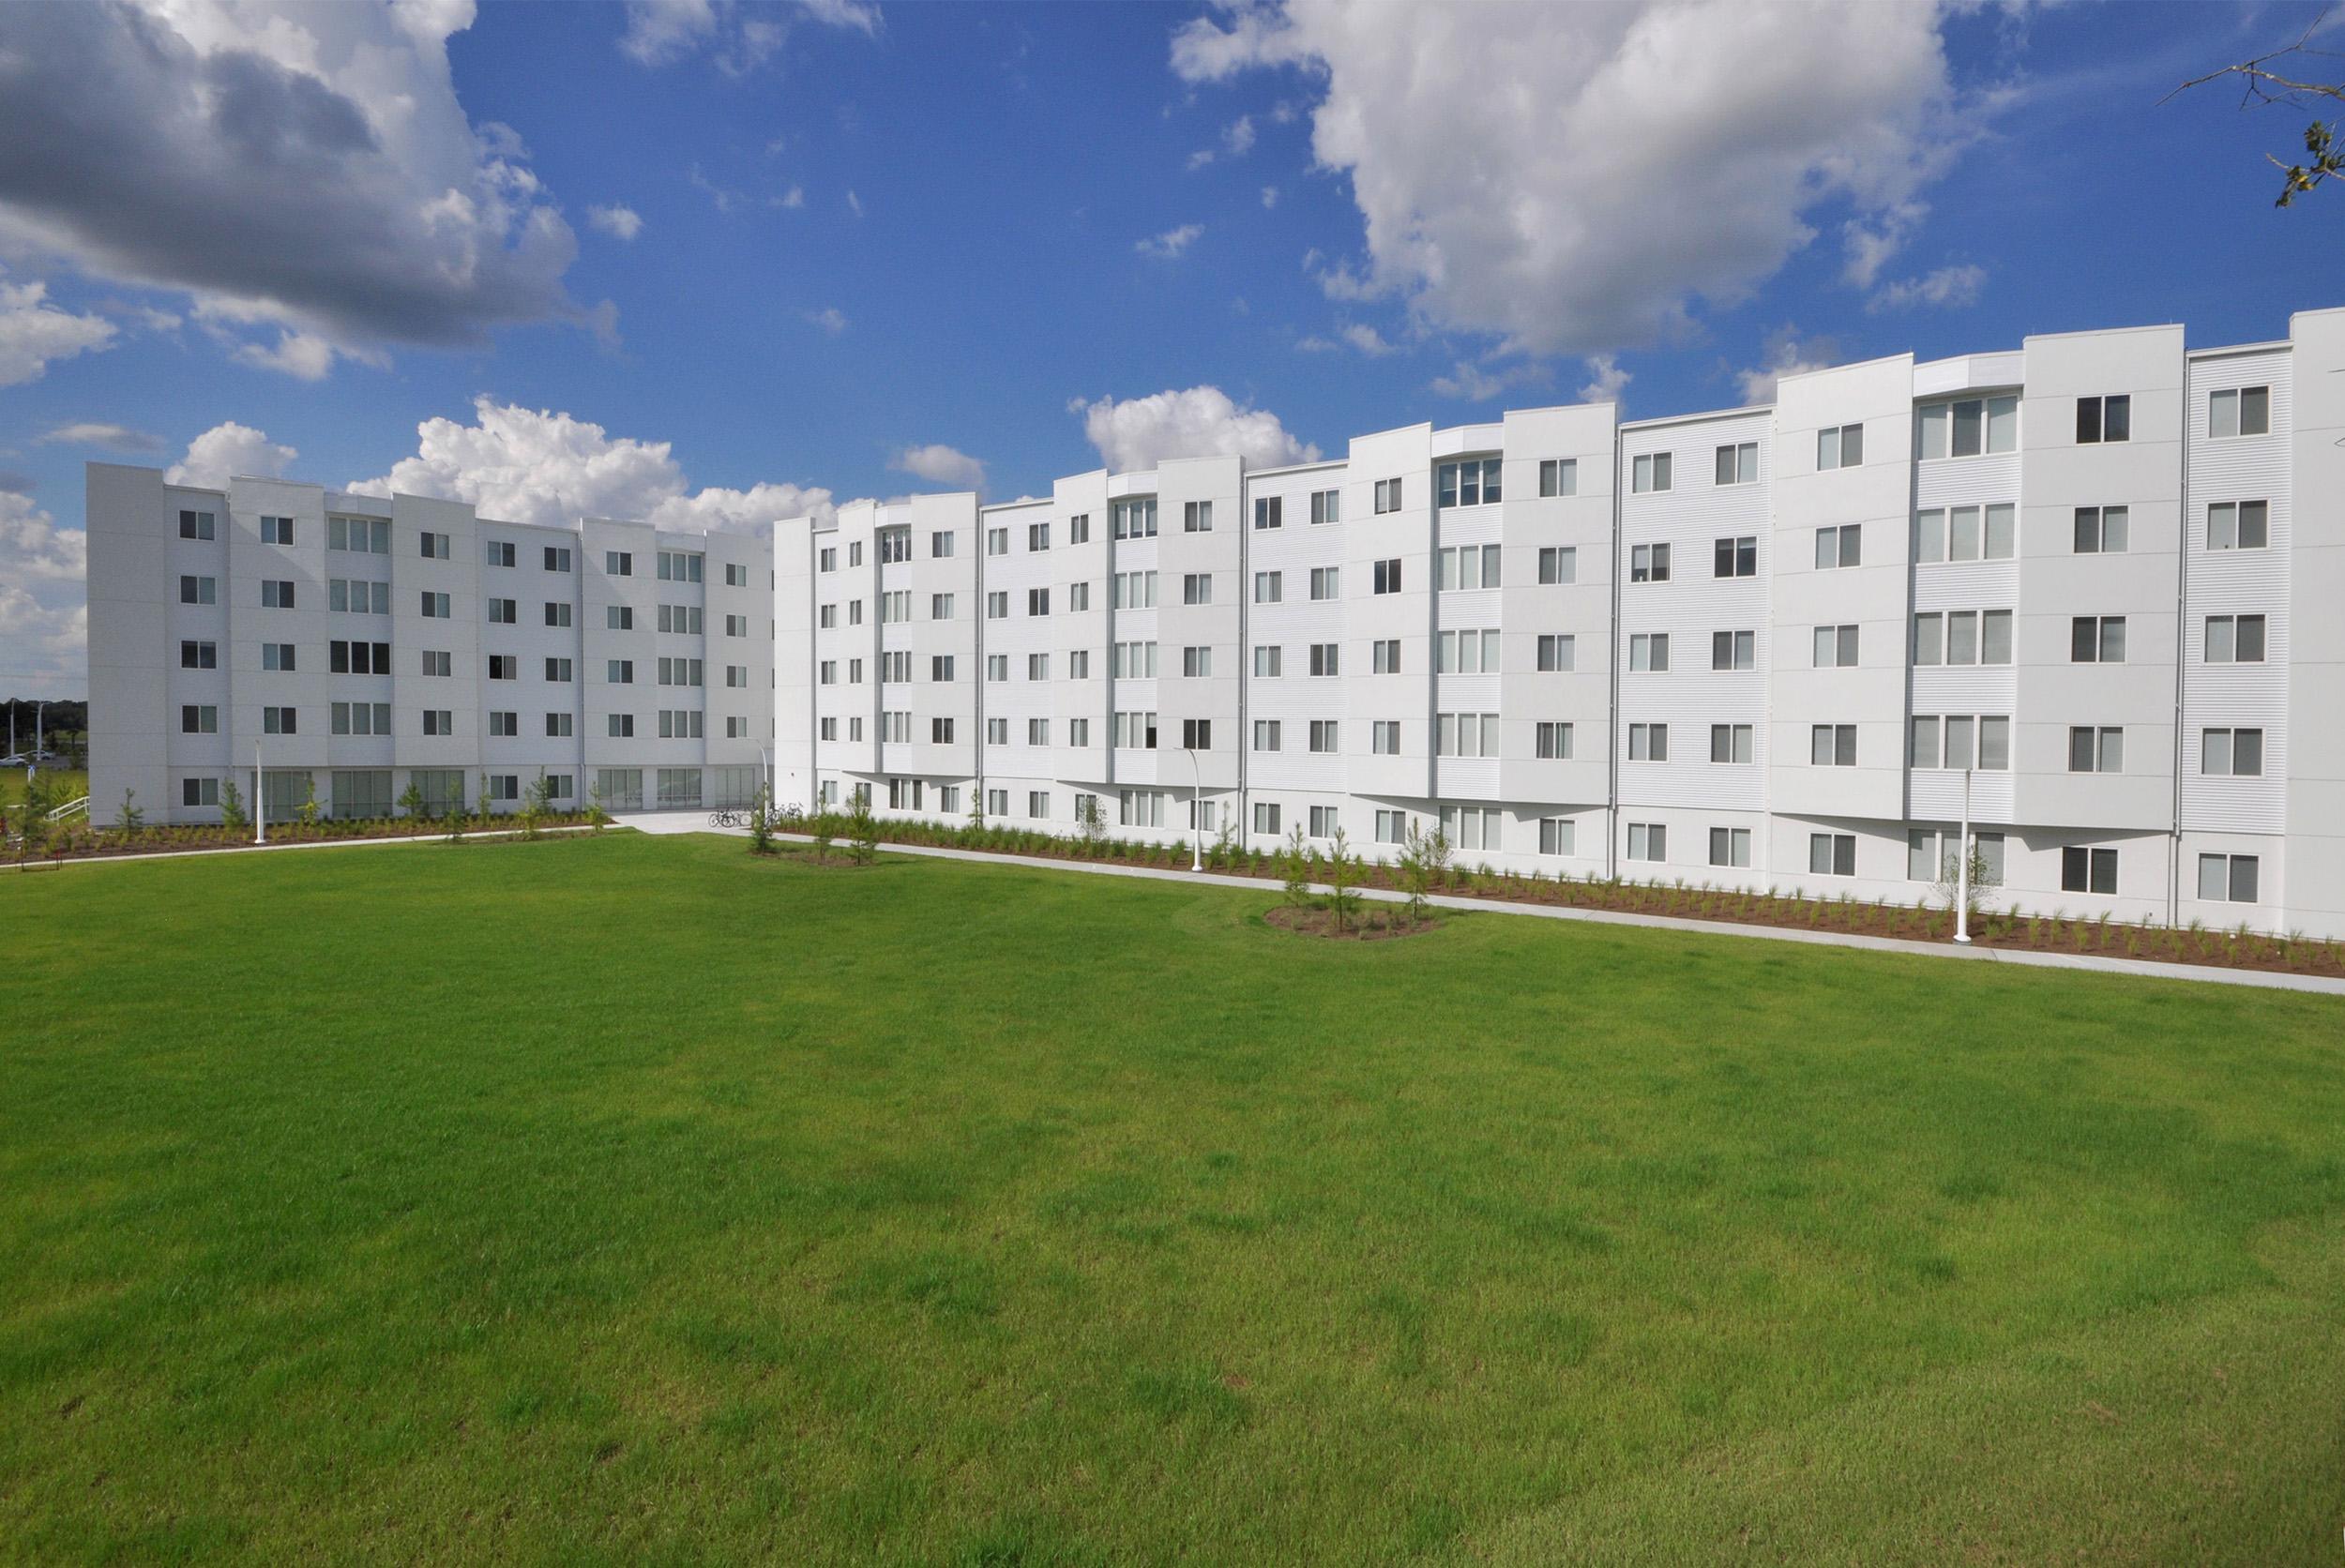 Student housing white multi story facility